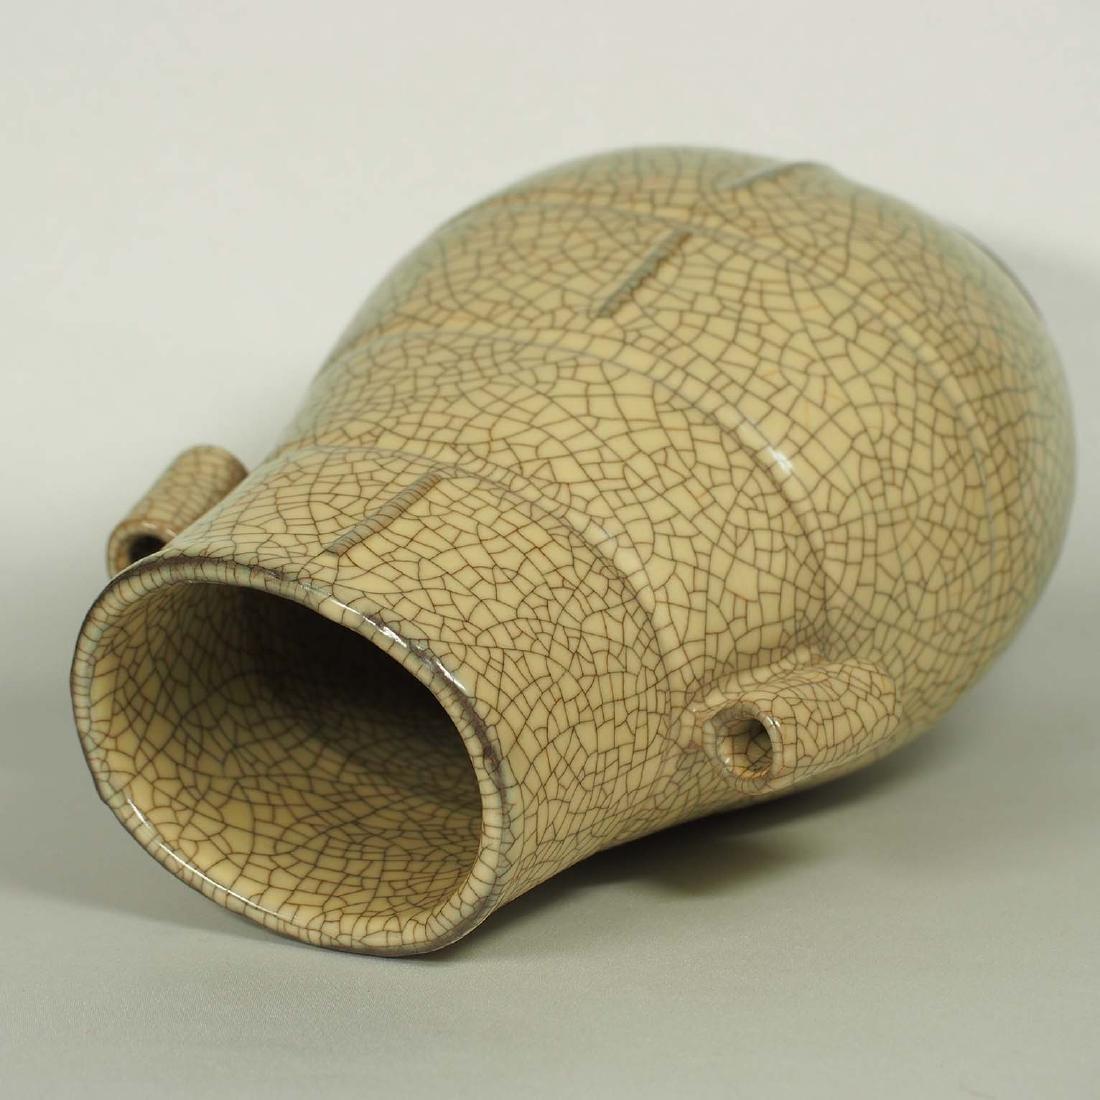 Ge Hu-Form Vase, early Ming Dynasty - 4